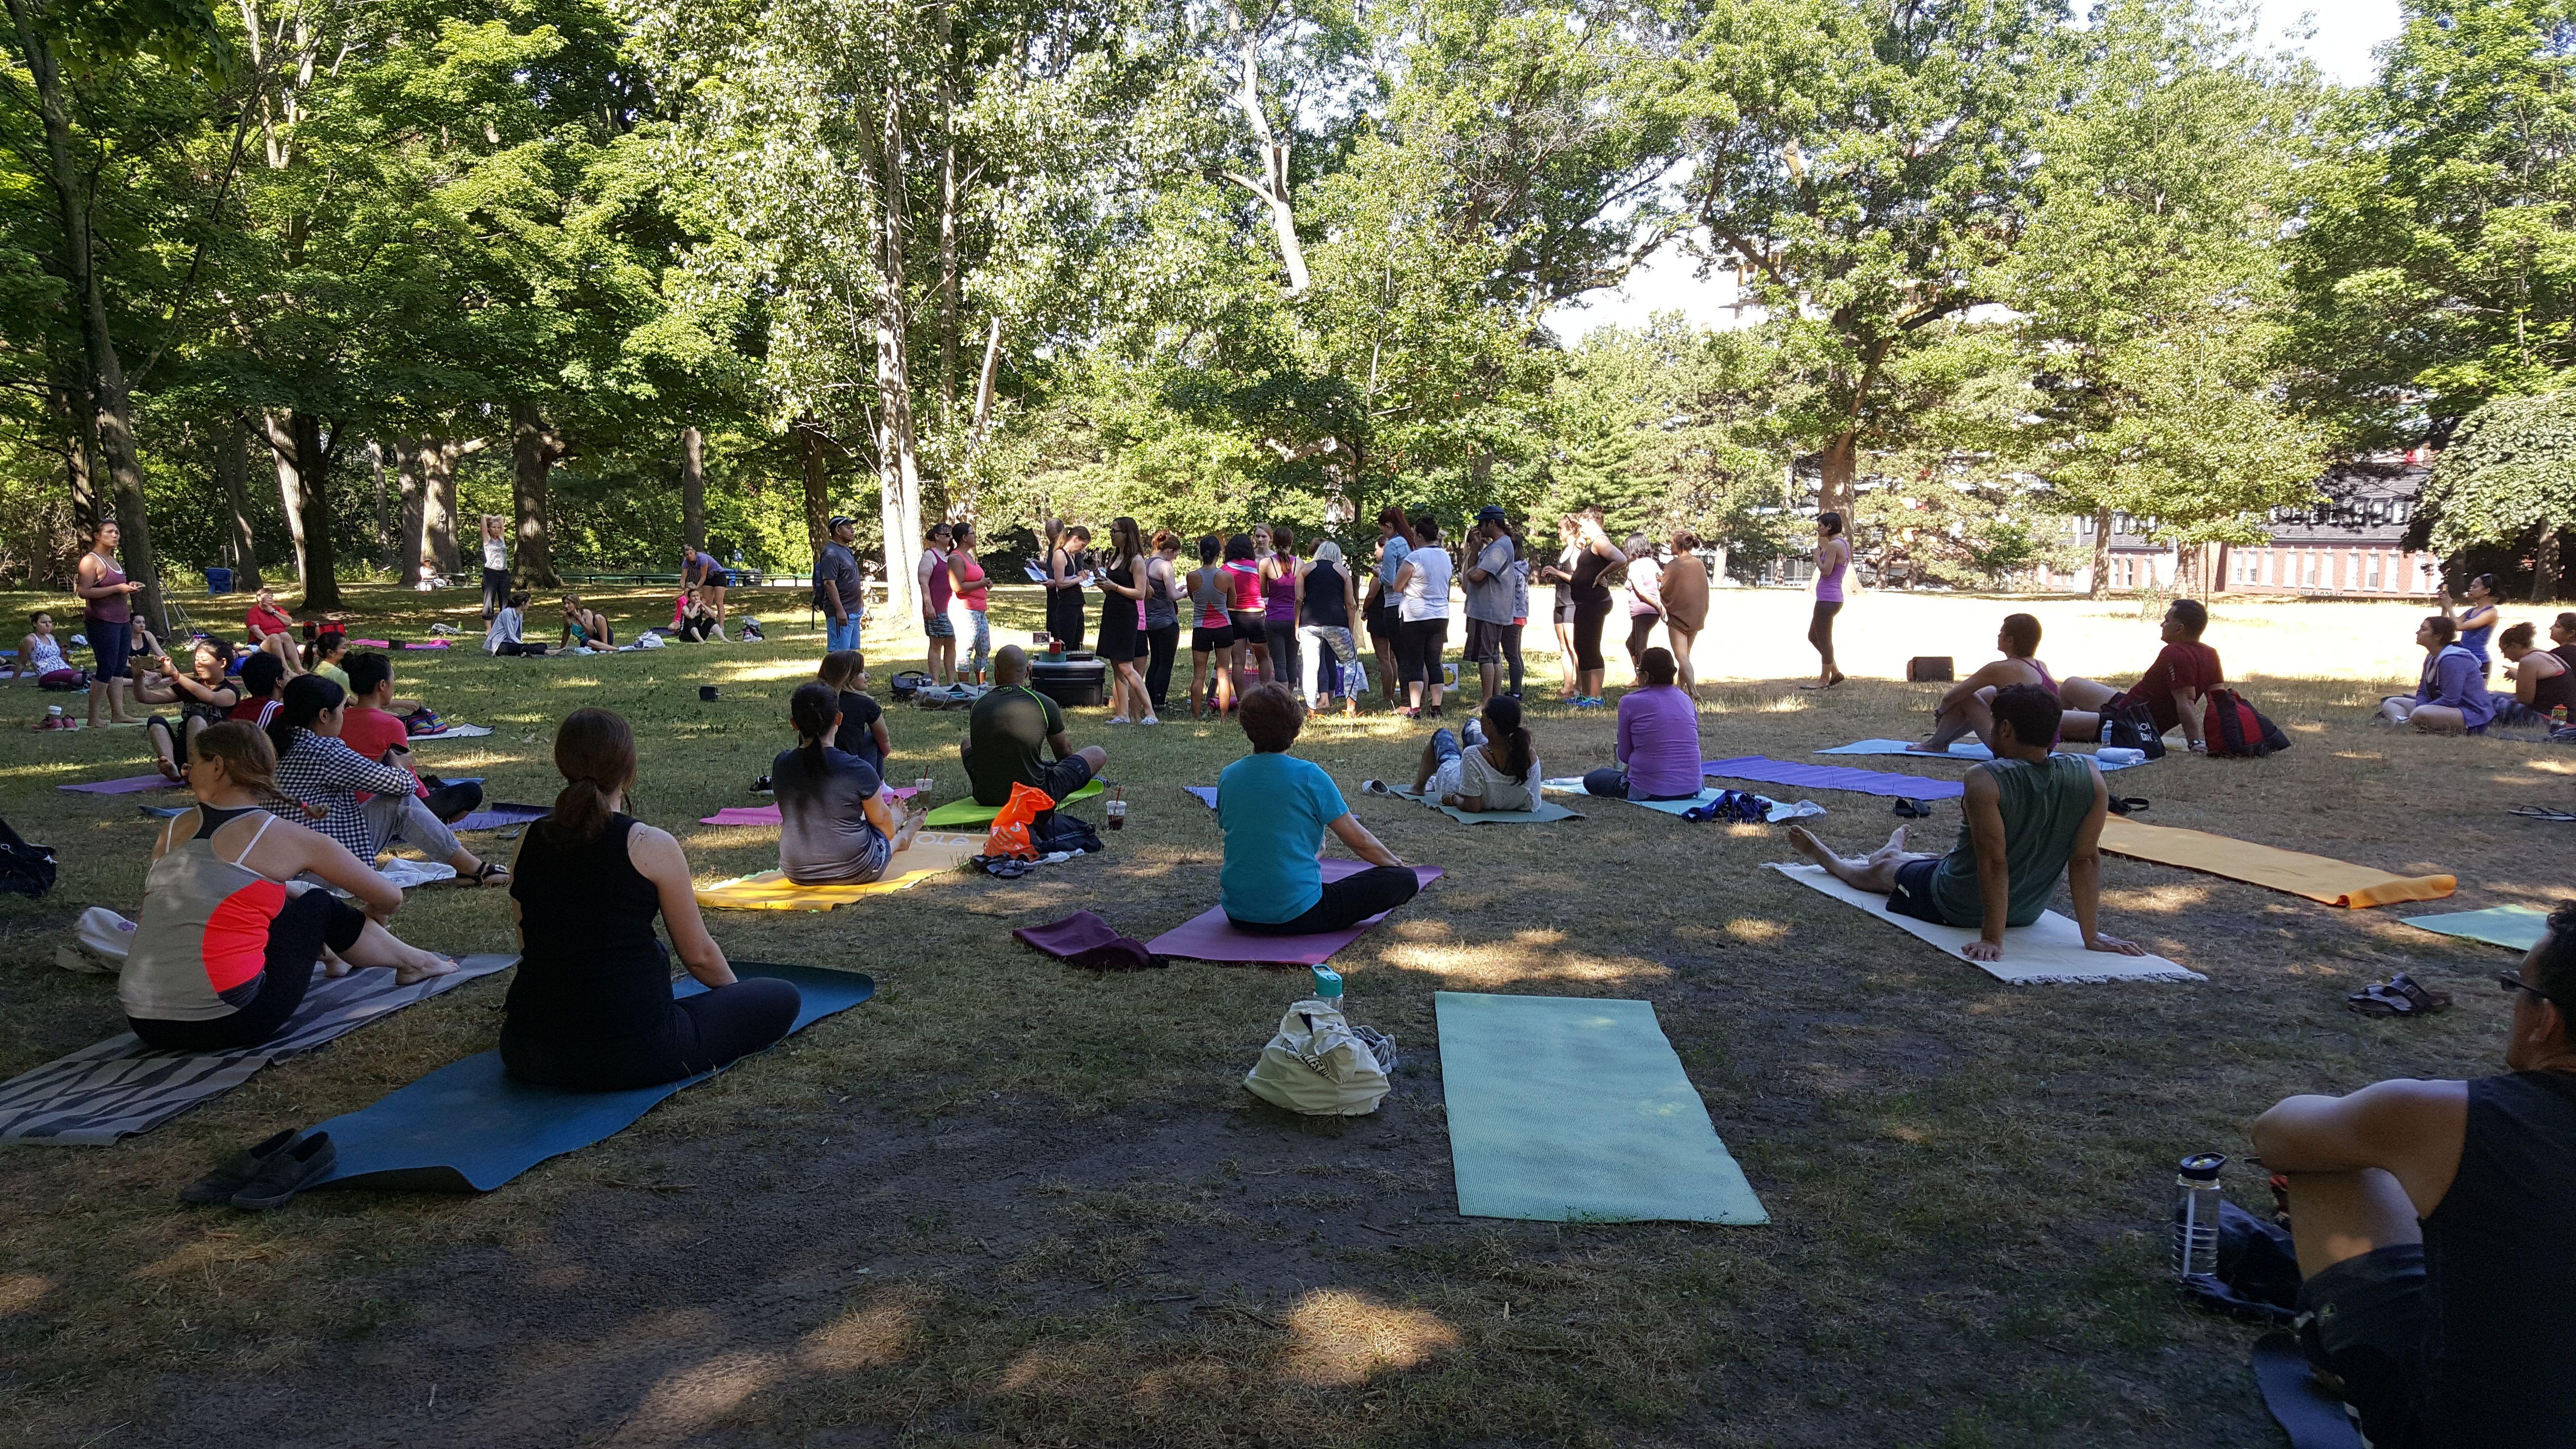 Yoga in Toronto!